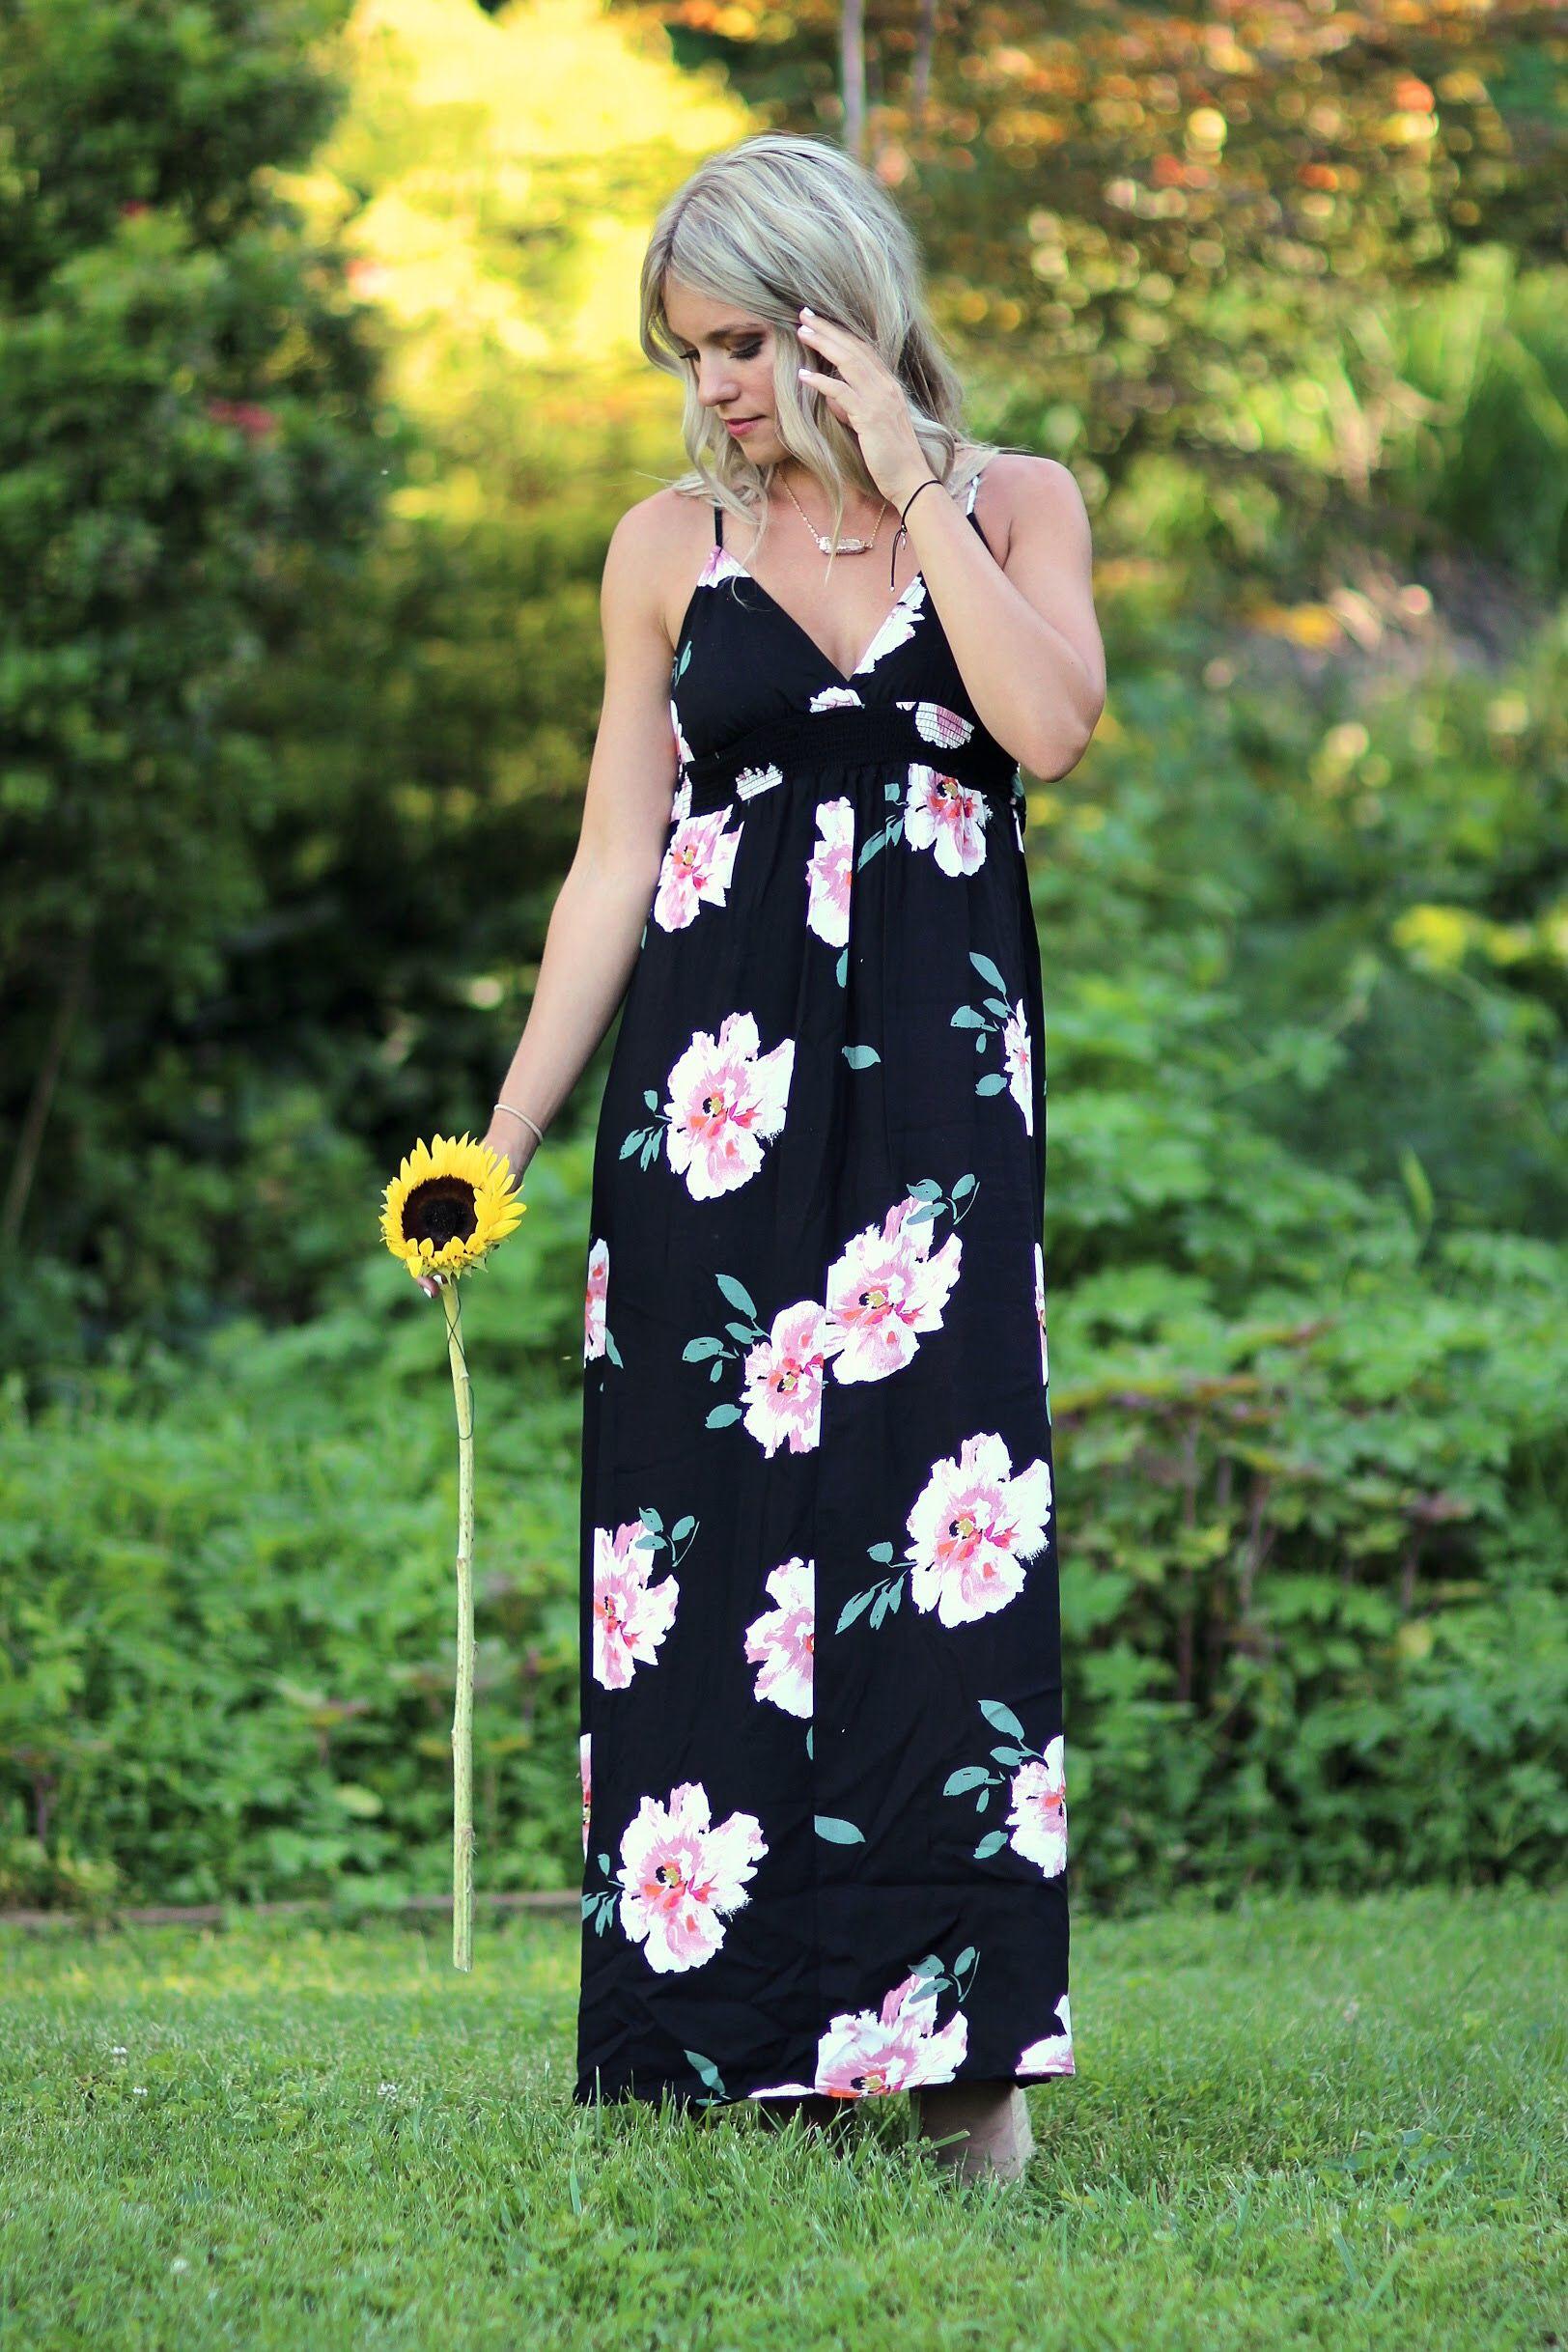 Black floral maxi dress floral dress boho womenus style womenus